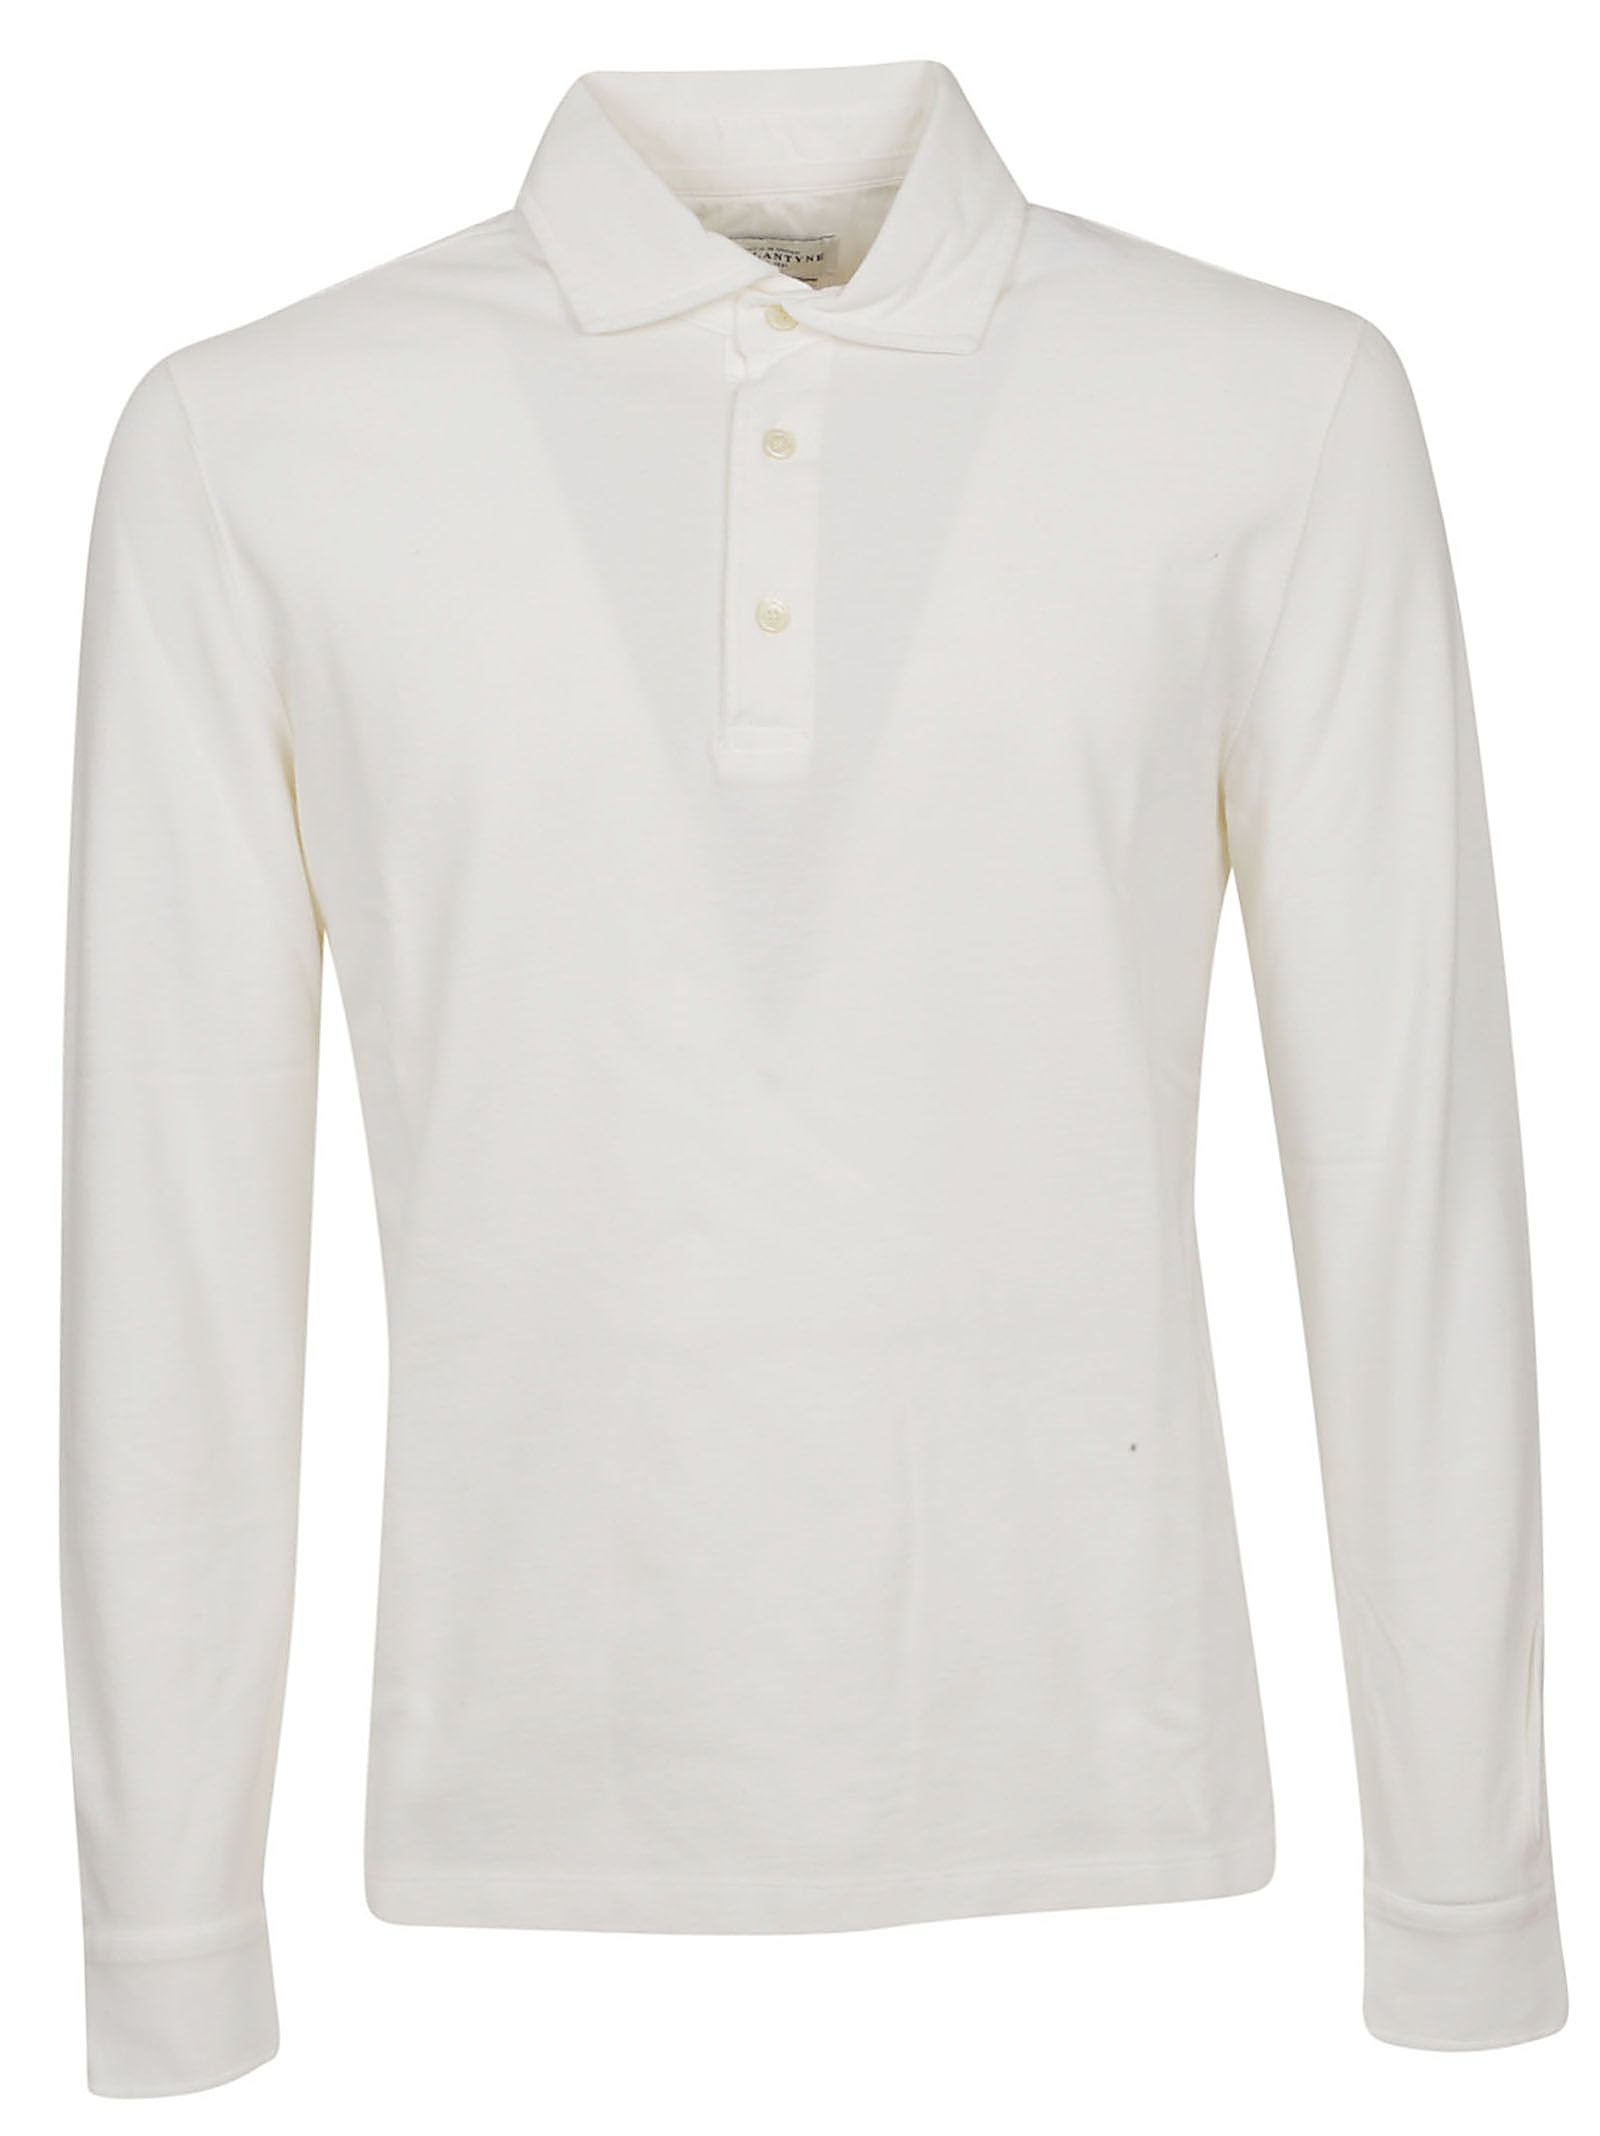 3f24ec666 Ballantyne Ballantyne Long-sleeved Polo Shirt - 10850146